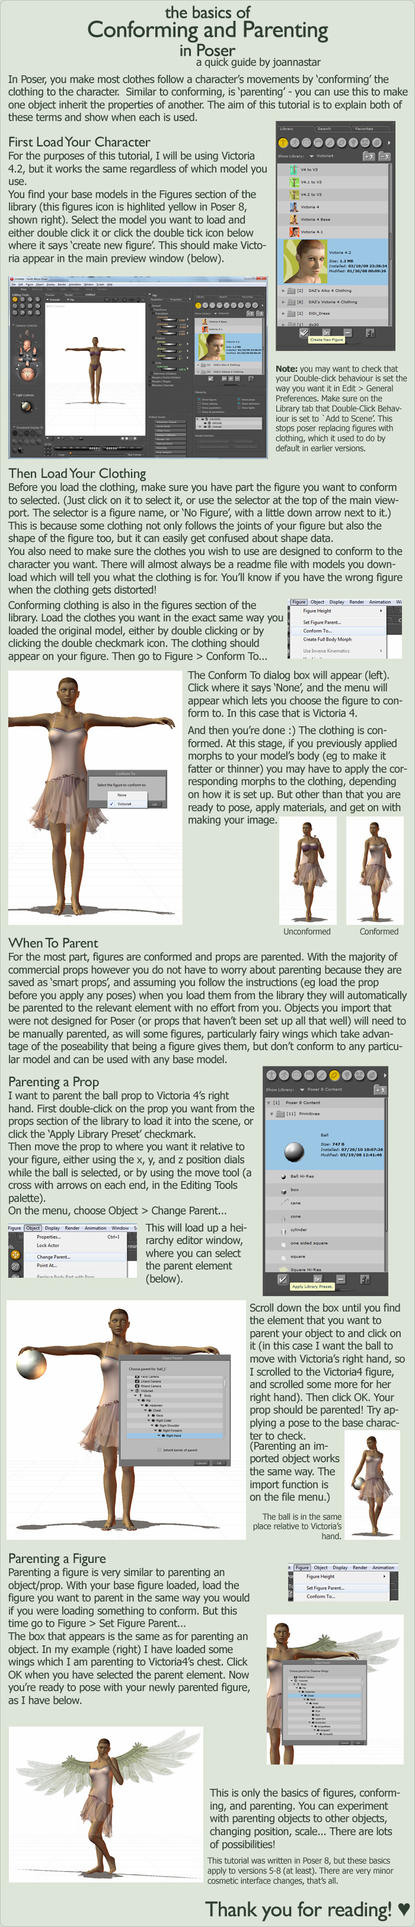 Poser: Conforming + Parenting by joannastar